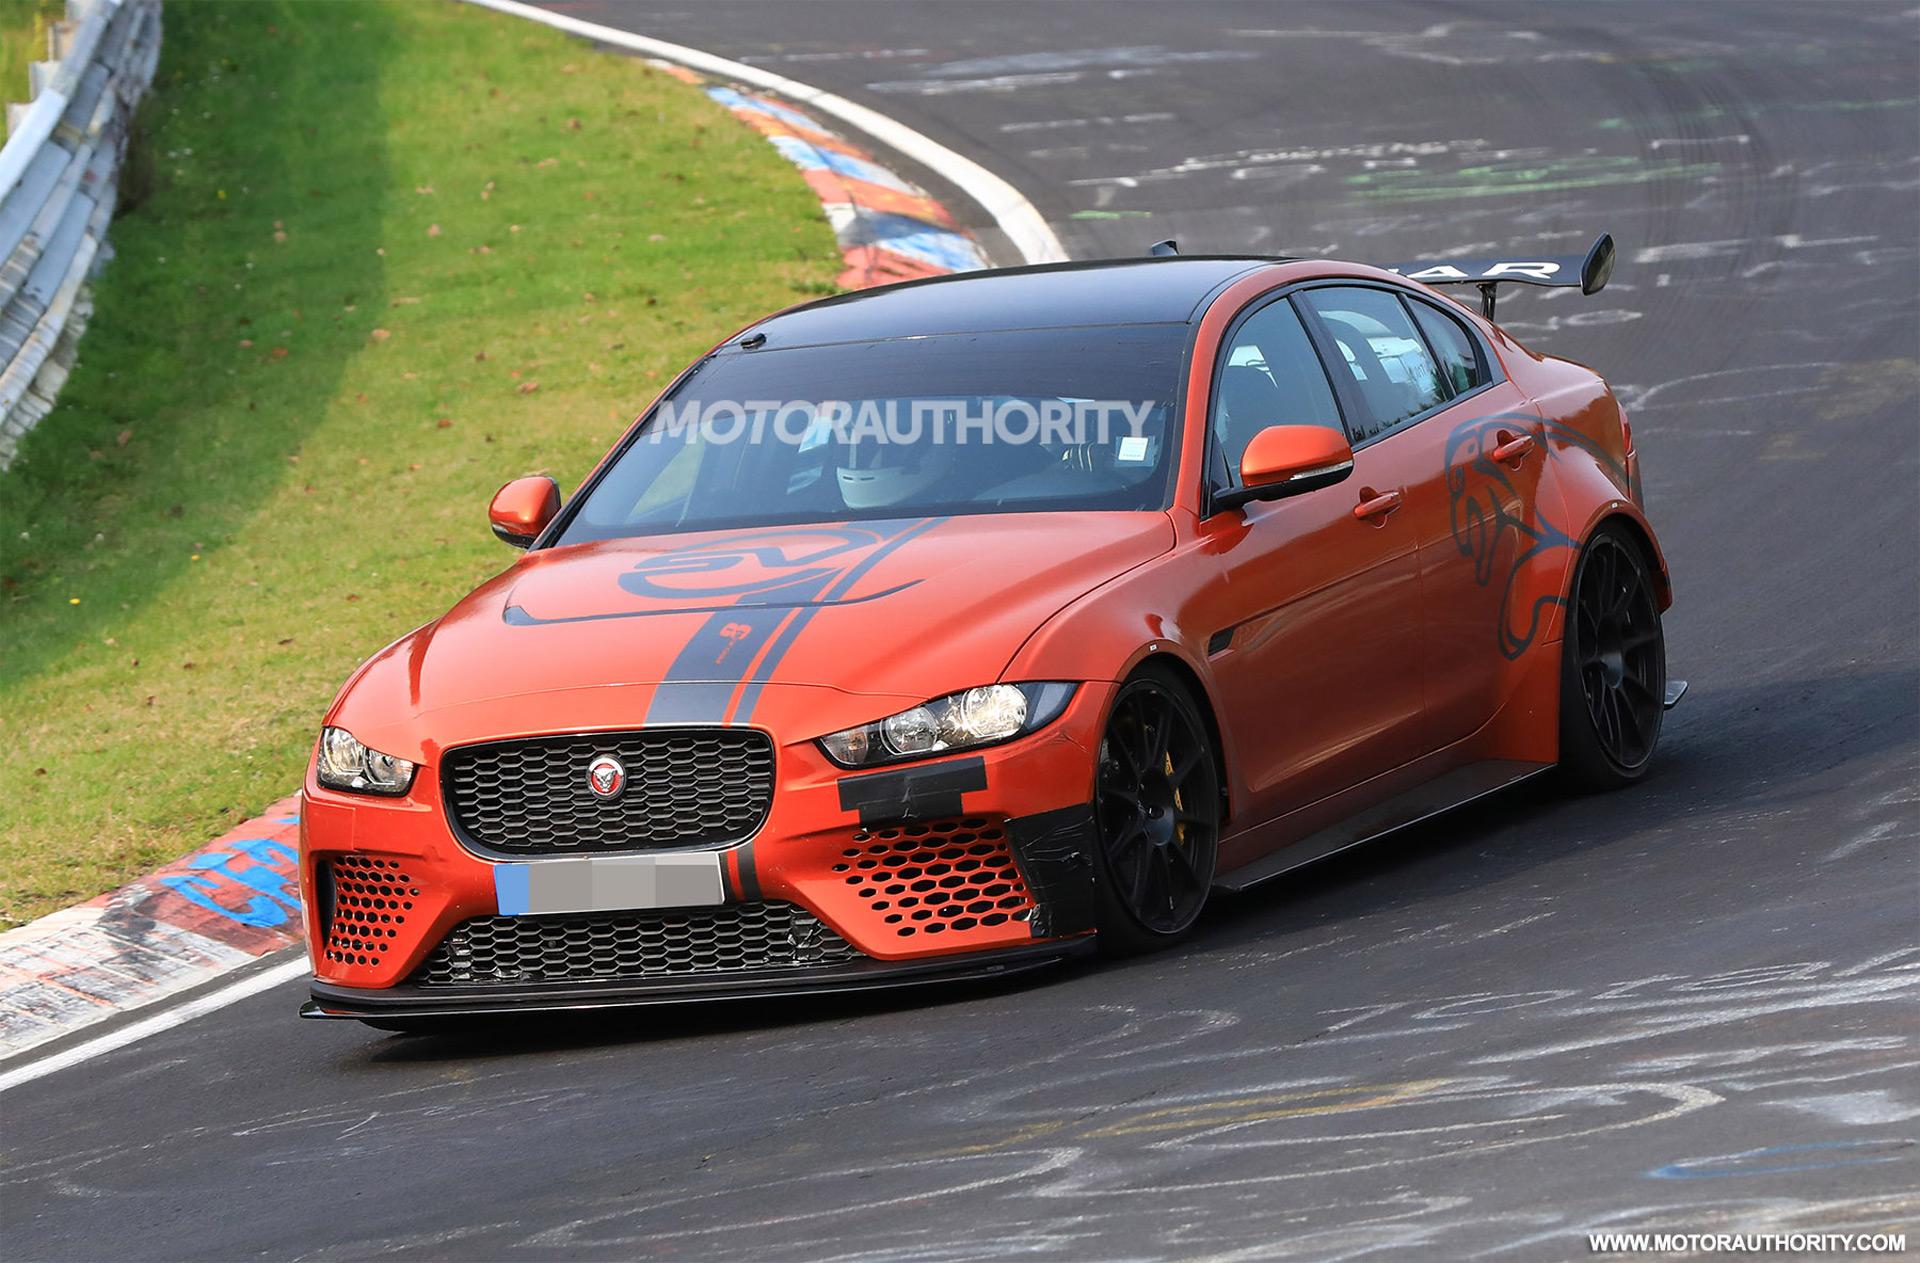 2018 jaguar 4 door. unique 2018 jaguar targeting 4 door nrburgring record with xe sv project 8 dekarlovofo  image collections intended 2018 jaguar